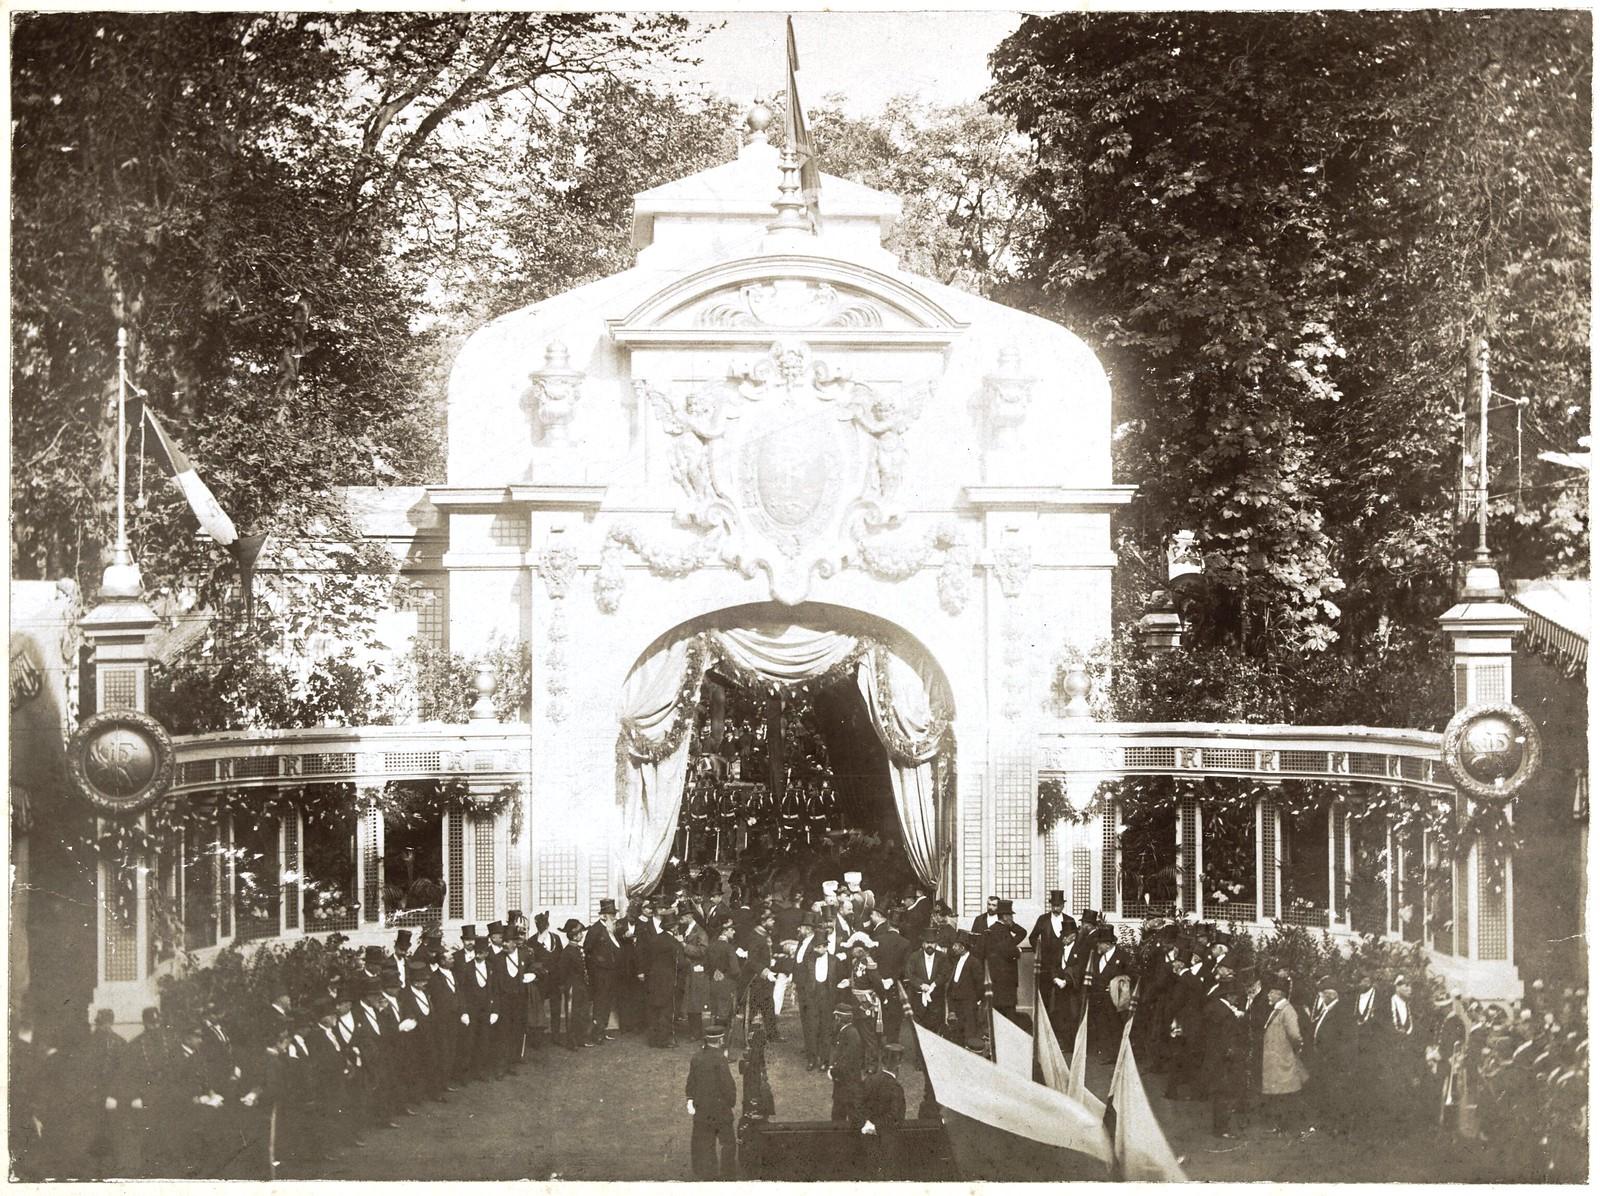 11. Porte Monumentale